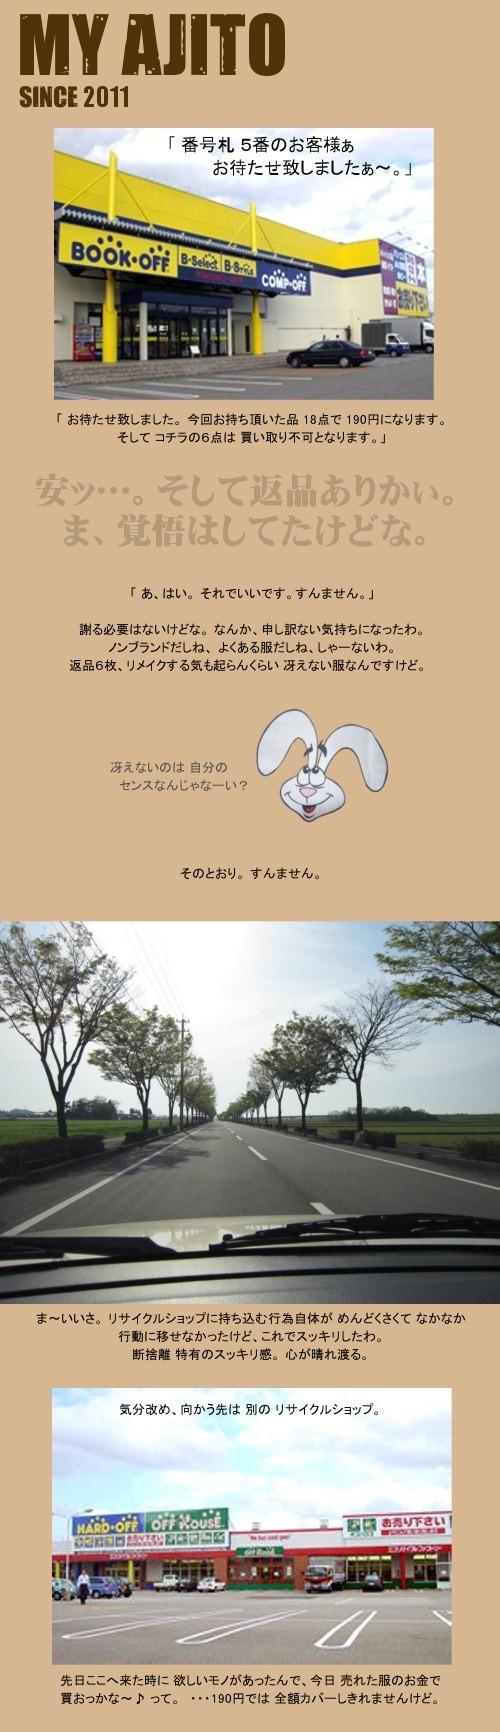 recy_02.jpg